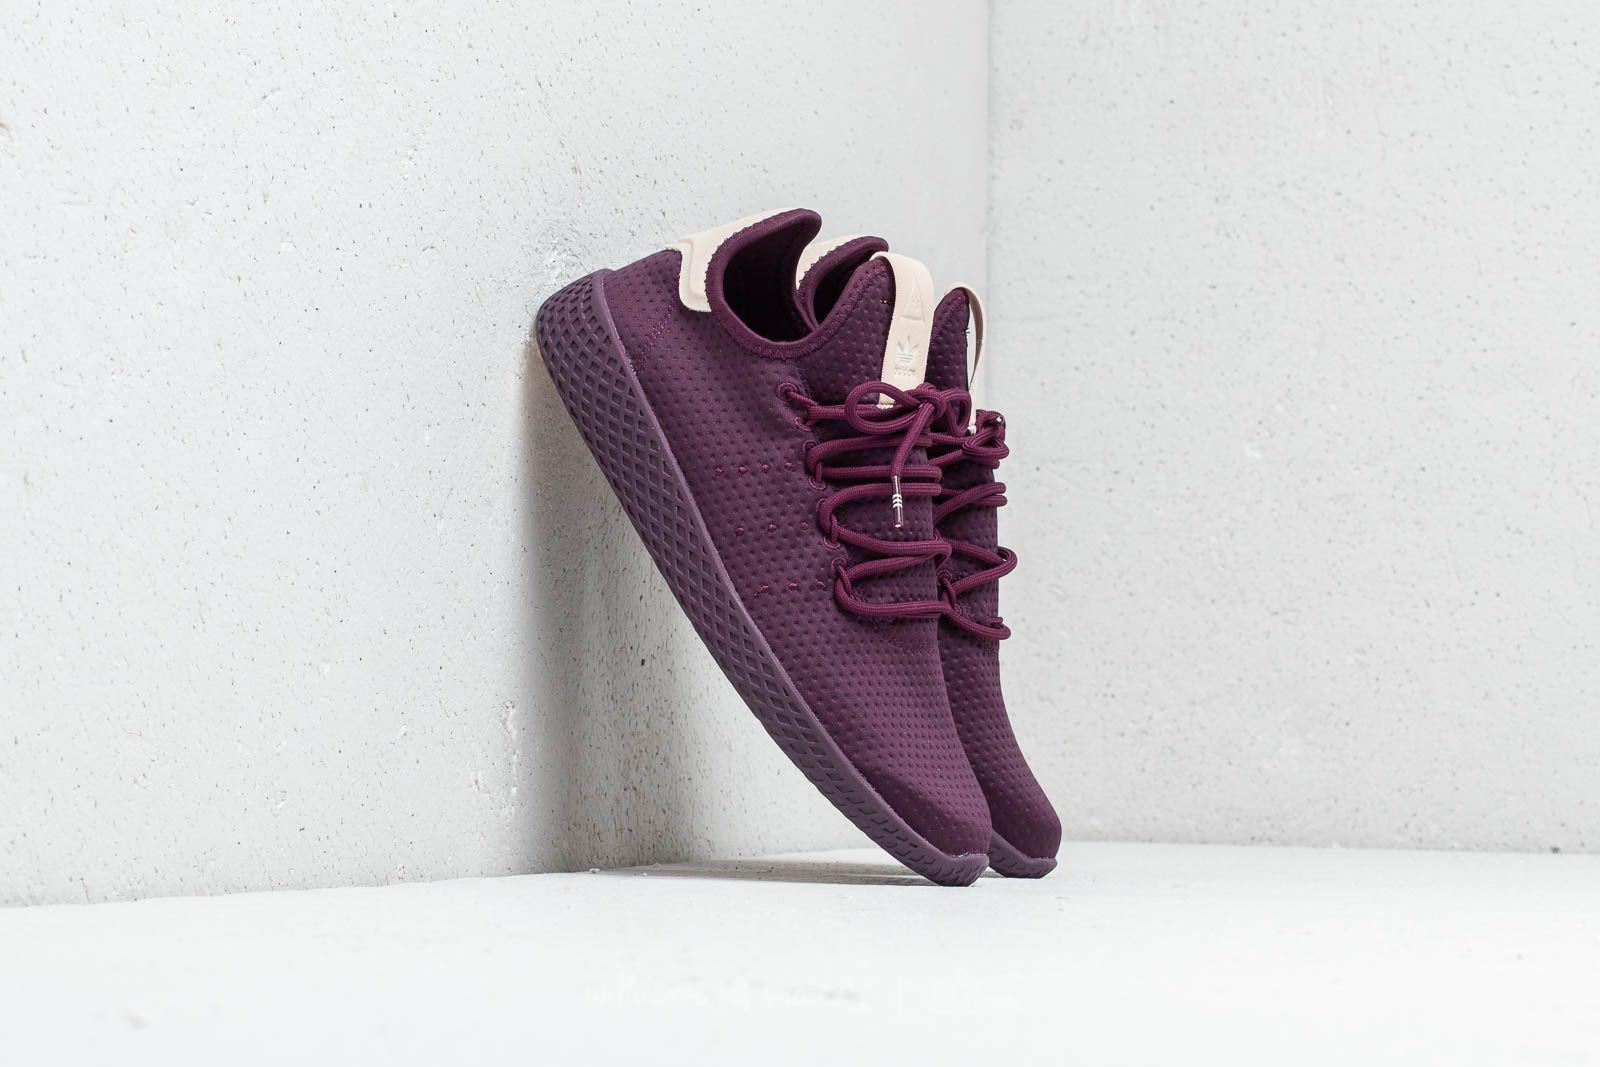 990cb8b82 Lyst - adidas Originals Adidas X Pharrell Williams Tennis Hu W Red ...